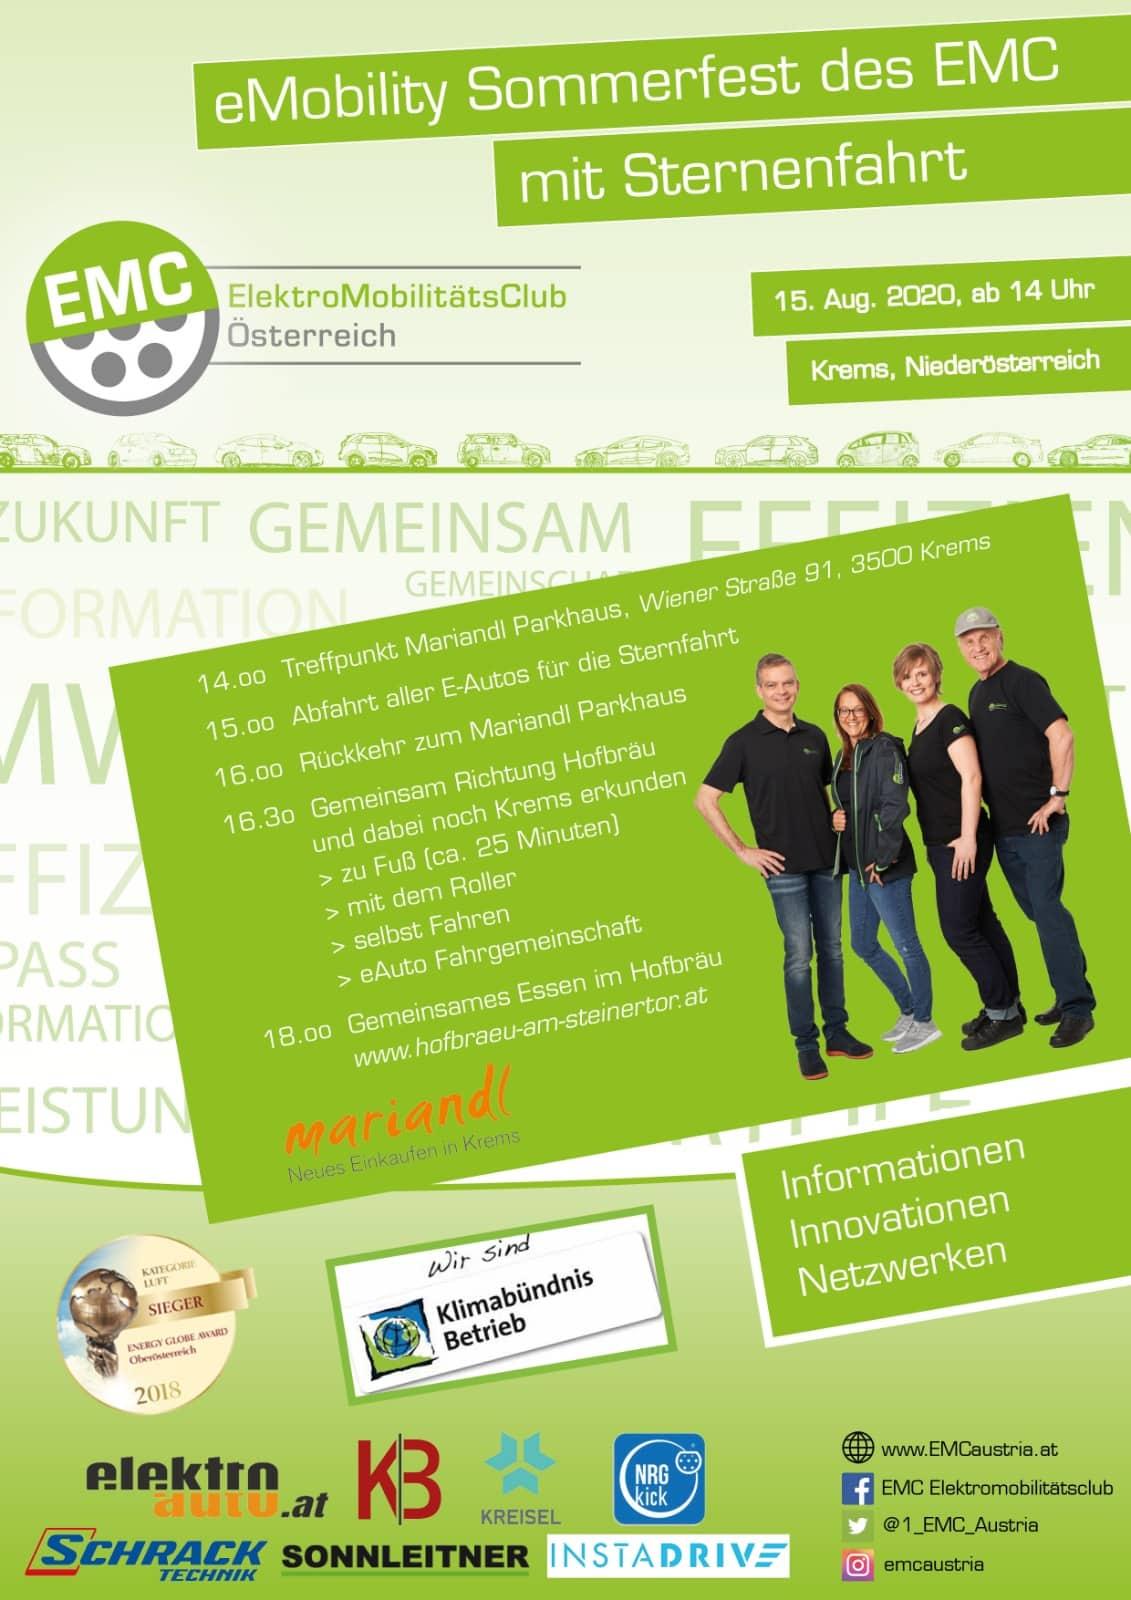 eMobility Sommerfest 2020 » WhatsApp Image 2020 07 21 at 14.15.10